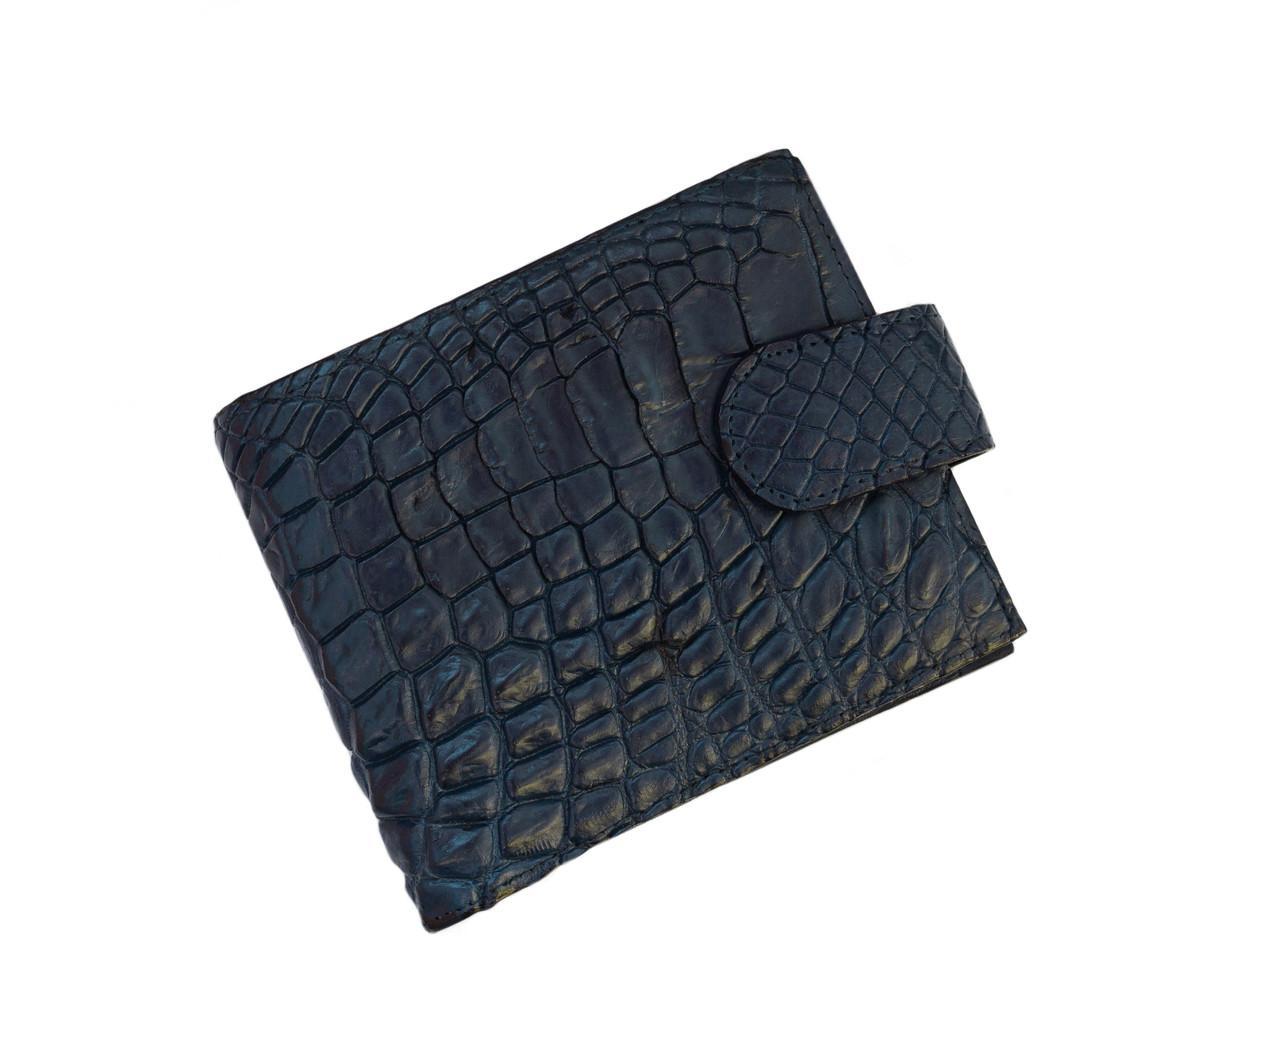 Кошелек из кожи крокодила Синий (cw 121)